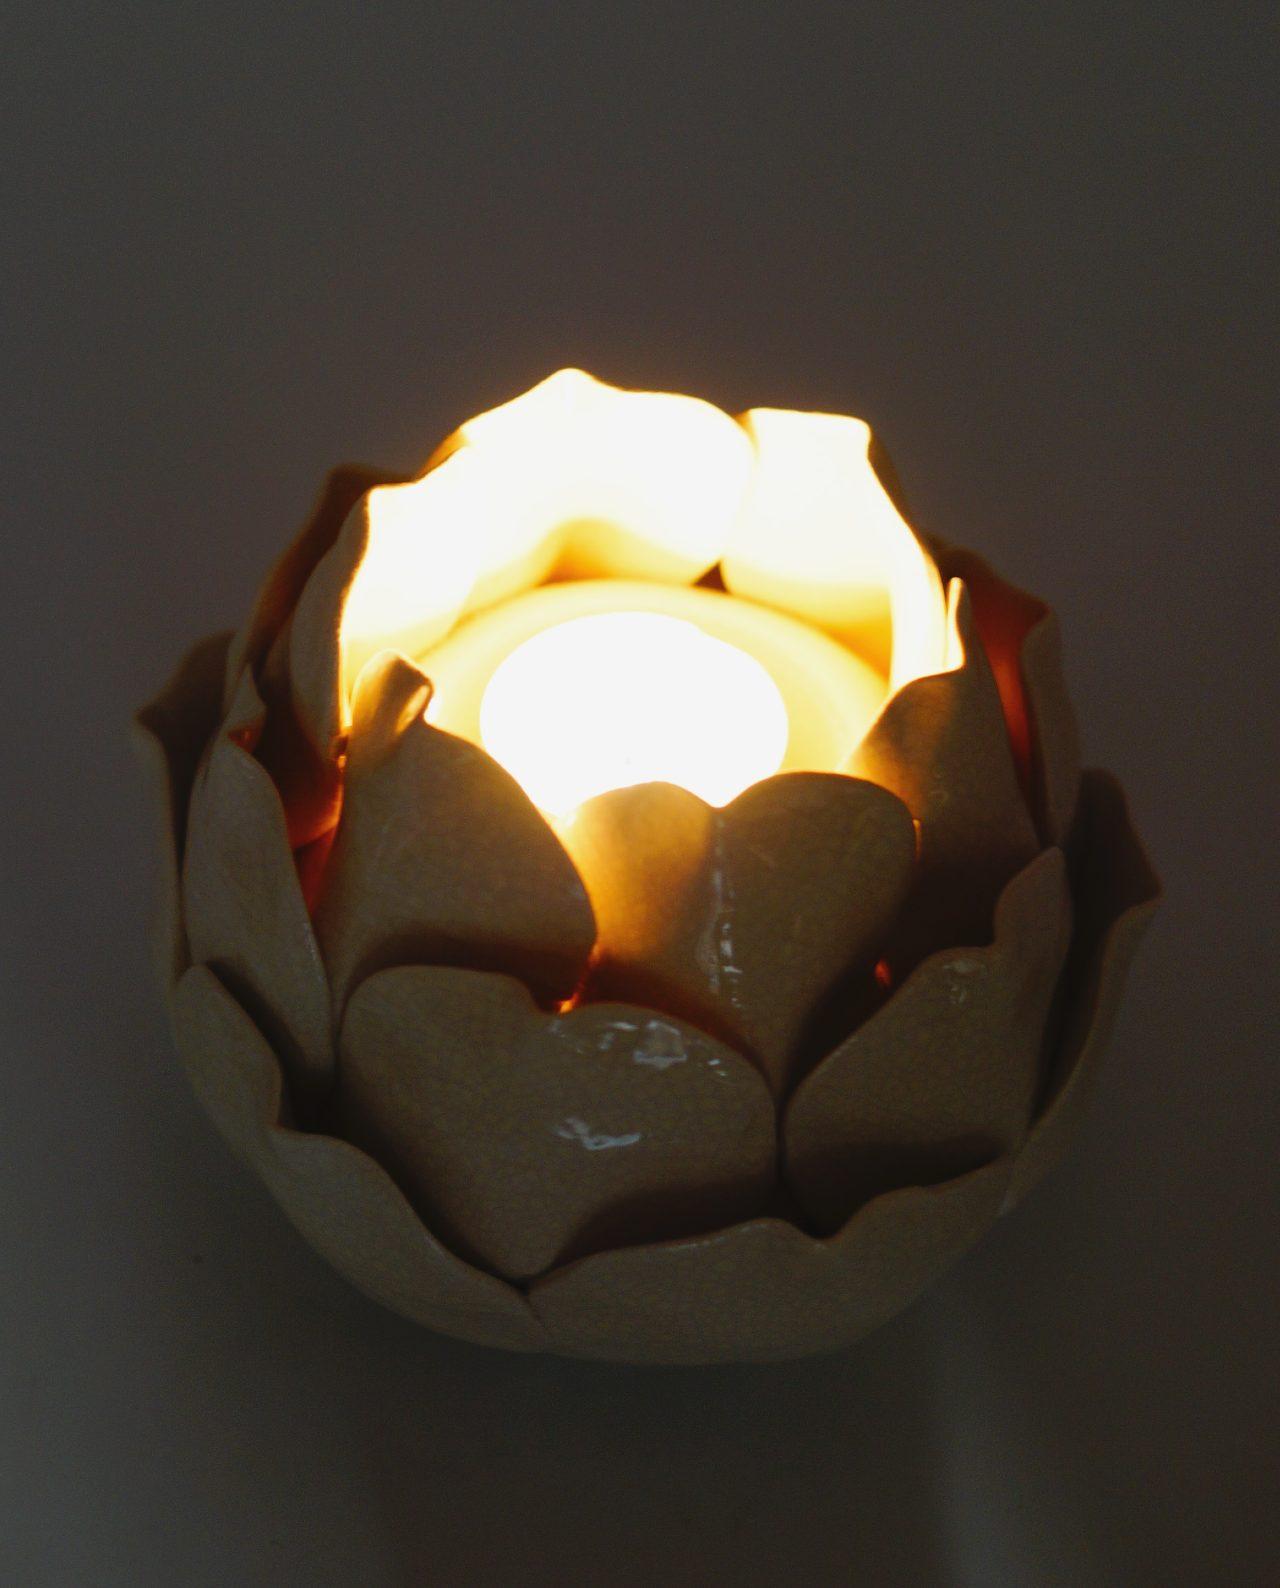 Tealight ceramic beige in the shape of a flower